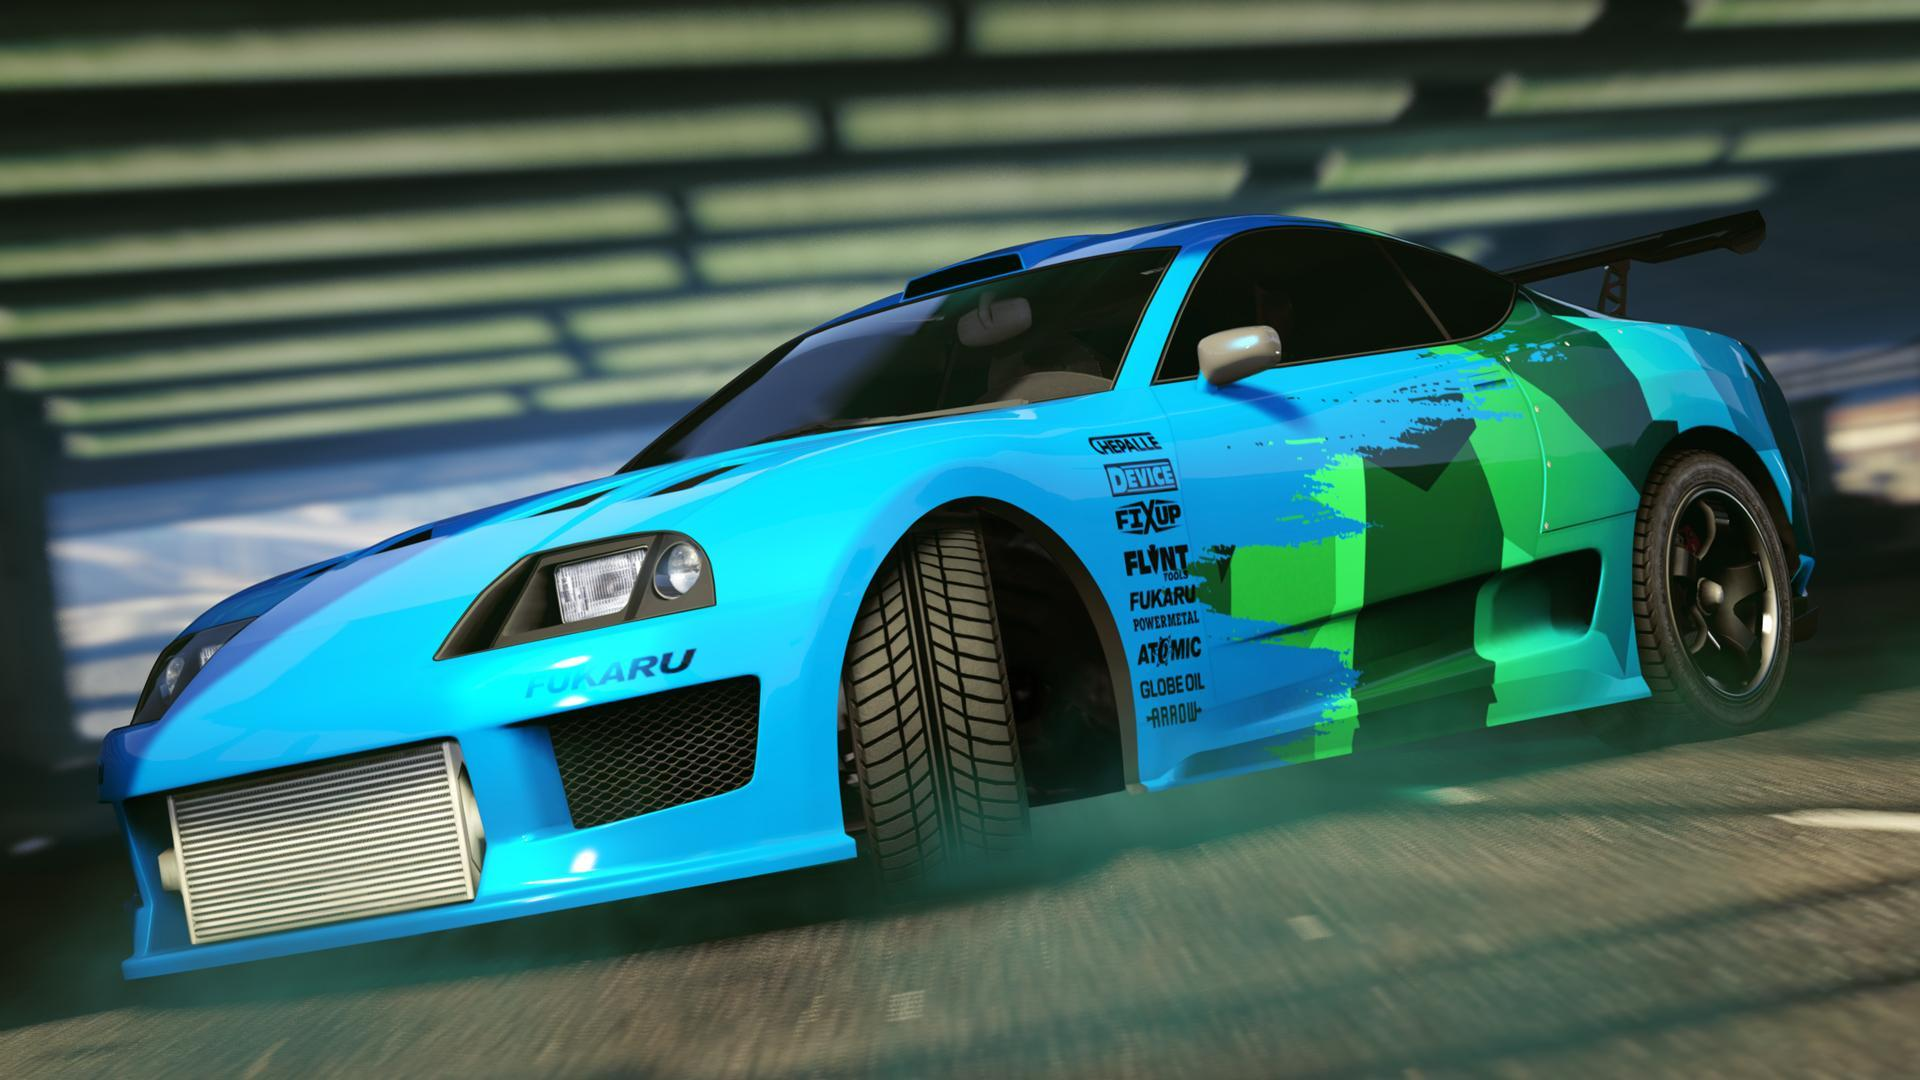 Jester Classic Gta V Gta Online Vehicles Database Statistics Grand Theft Auto V